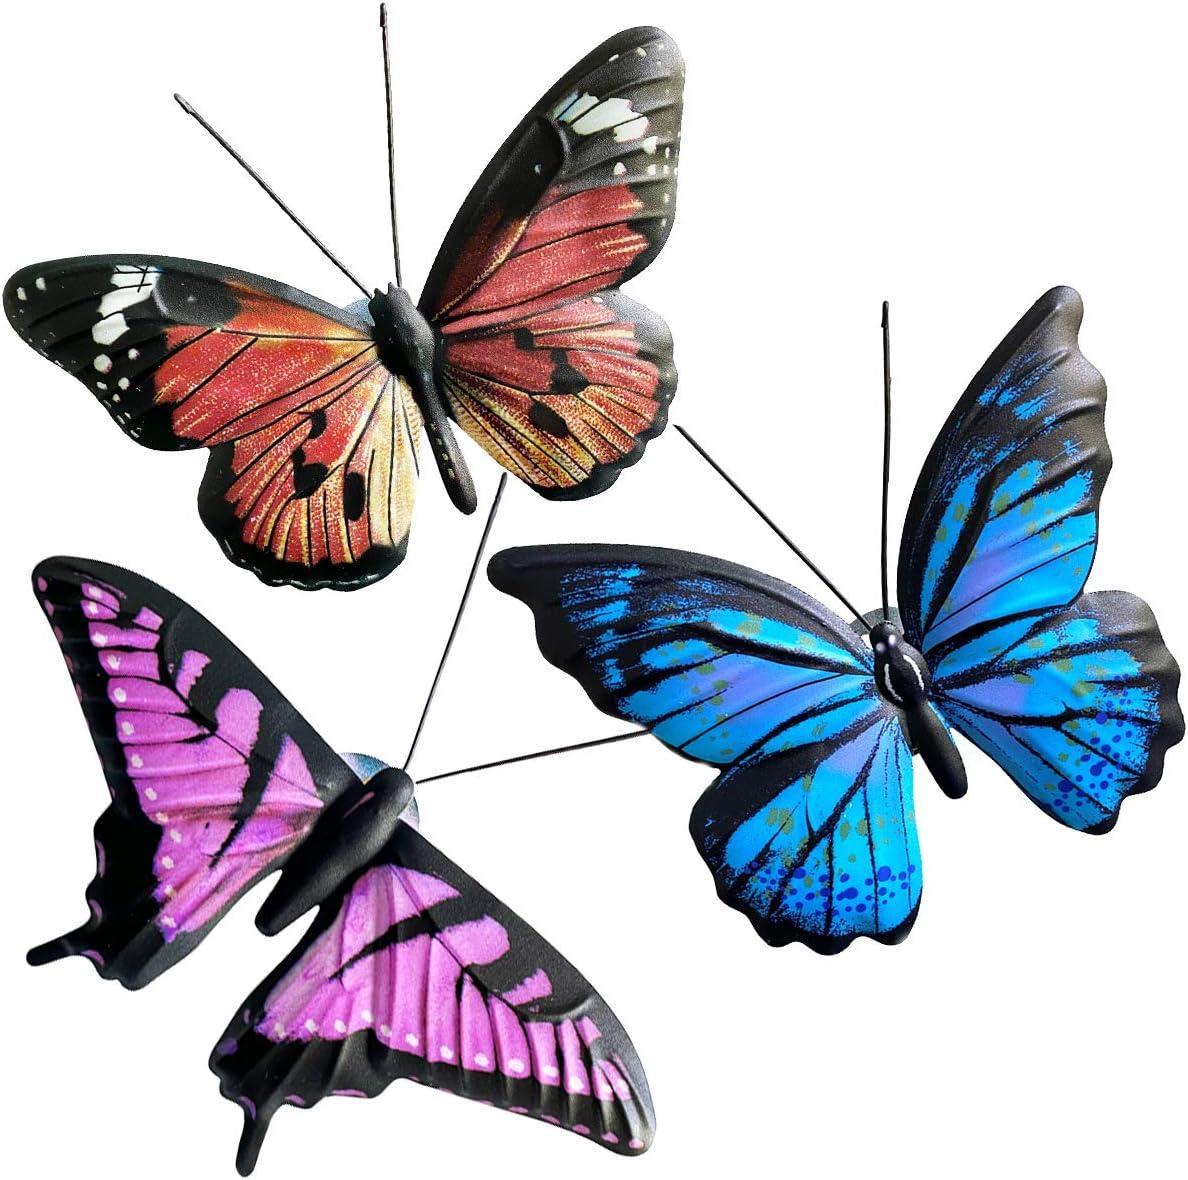 Eoorau Metal Butterfly Wall Art, 3D Butterflies Wall Decor Sculpture Hanging for Indoor and Outdoor, 3 Pack